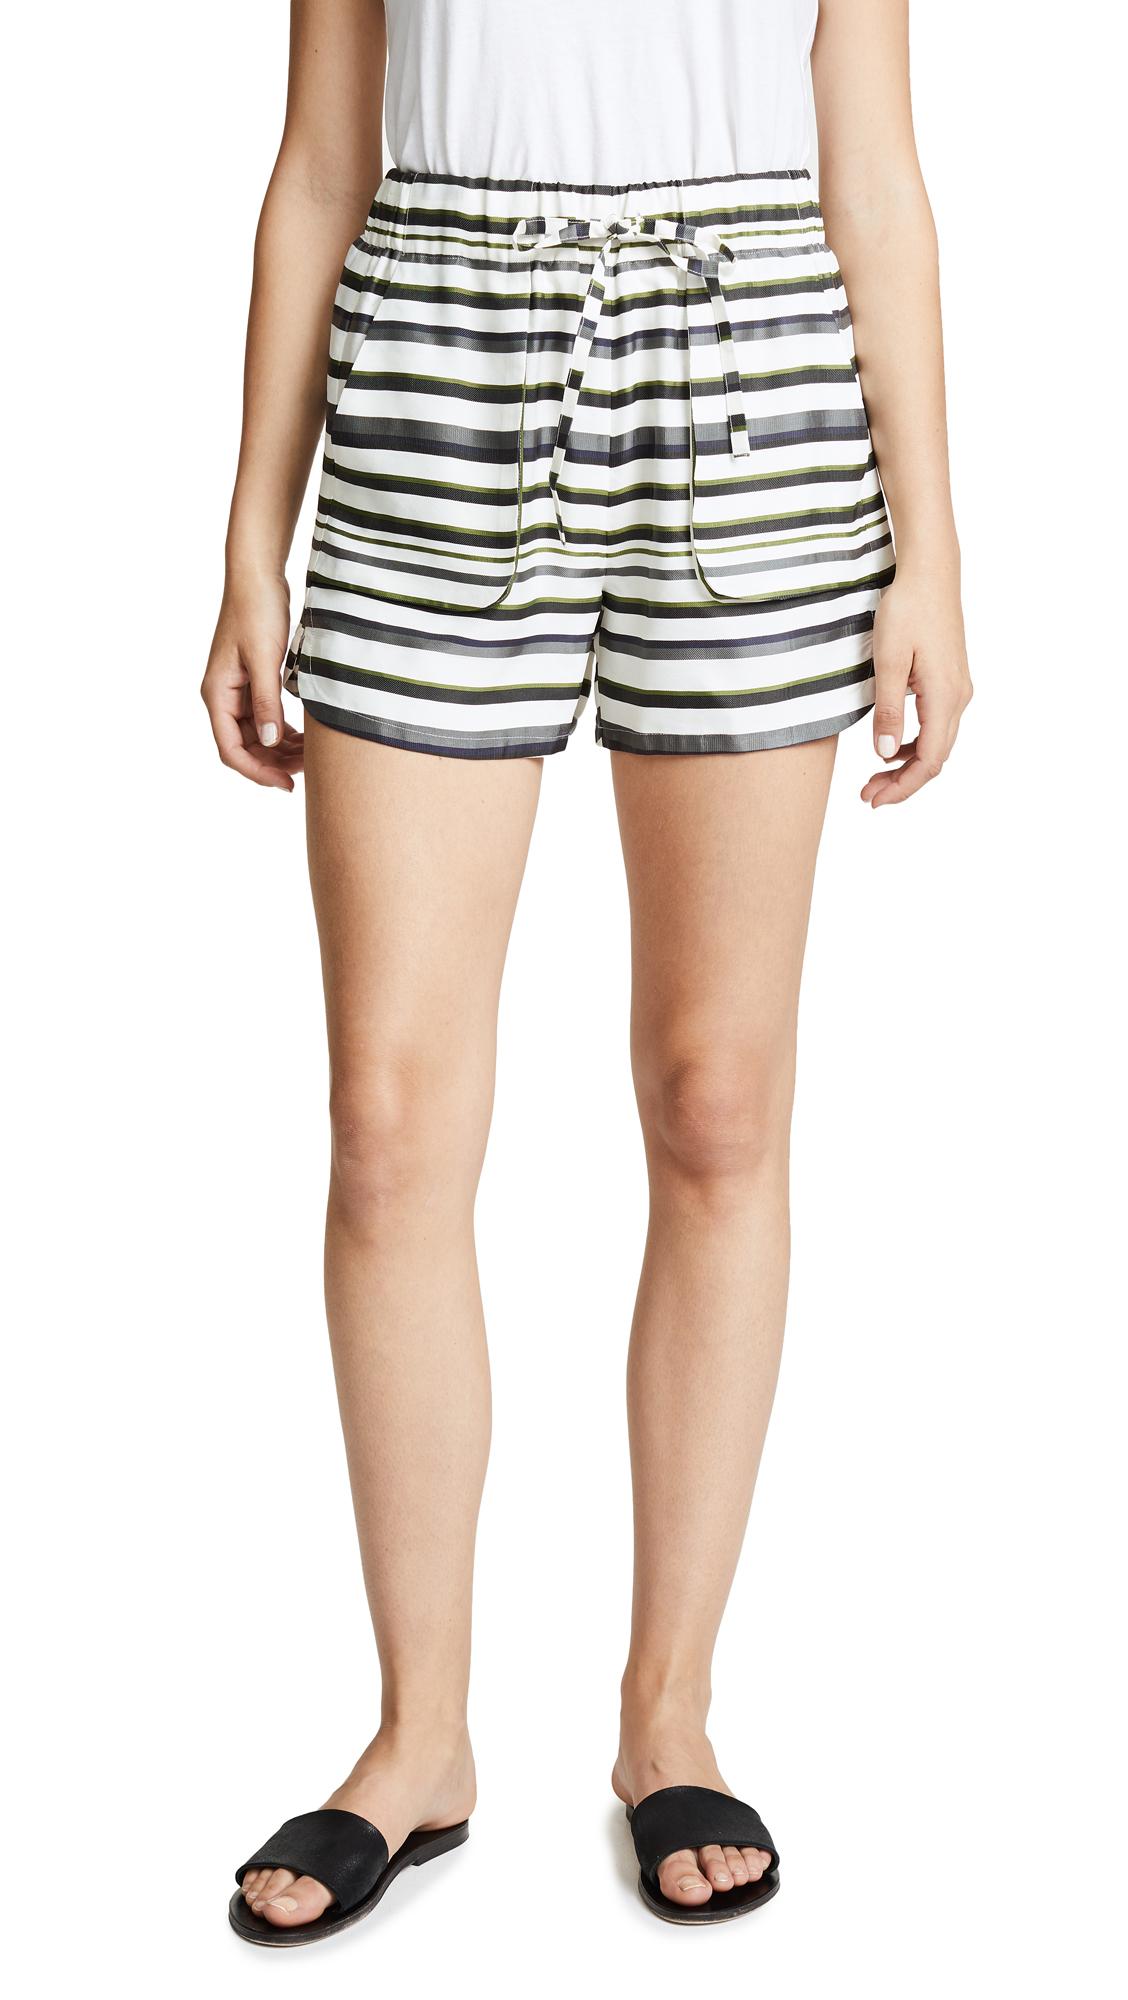 AYR Lemonade Shorts In Stripe